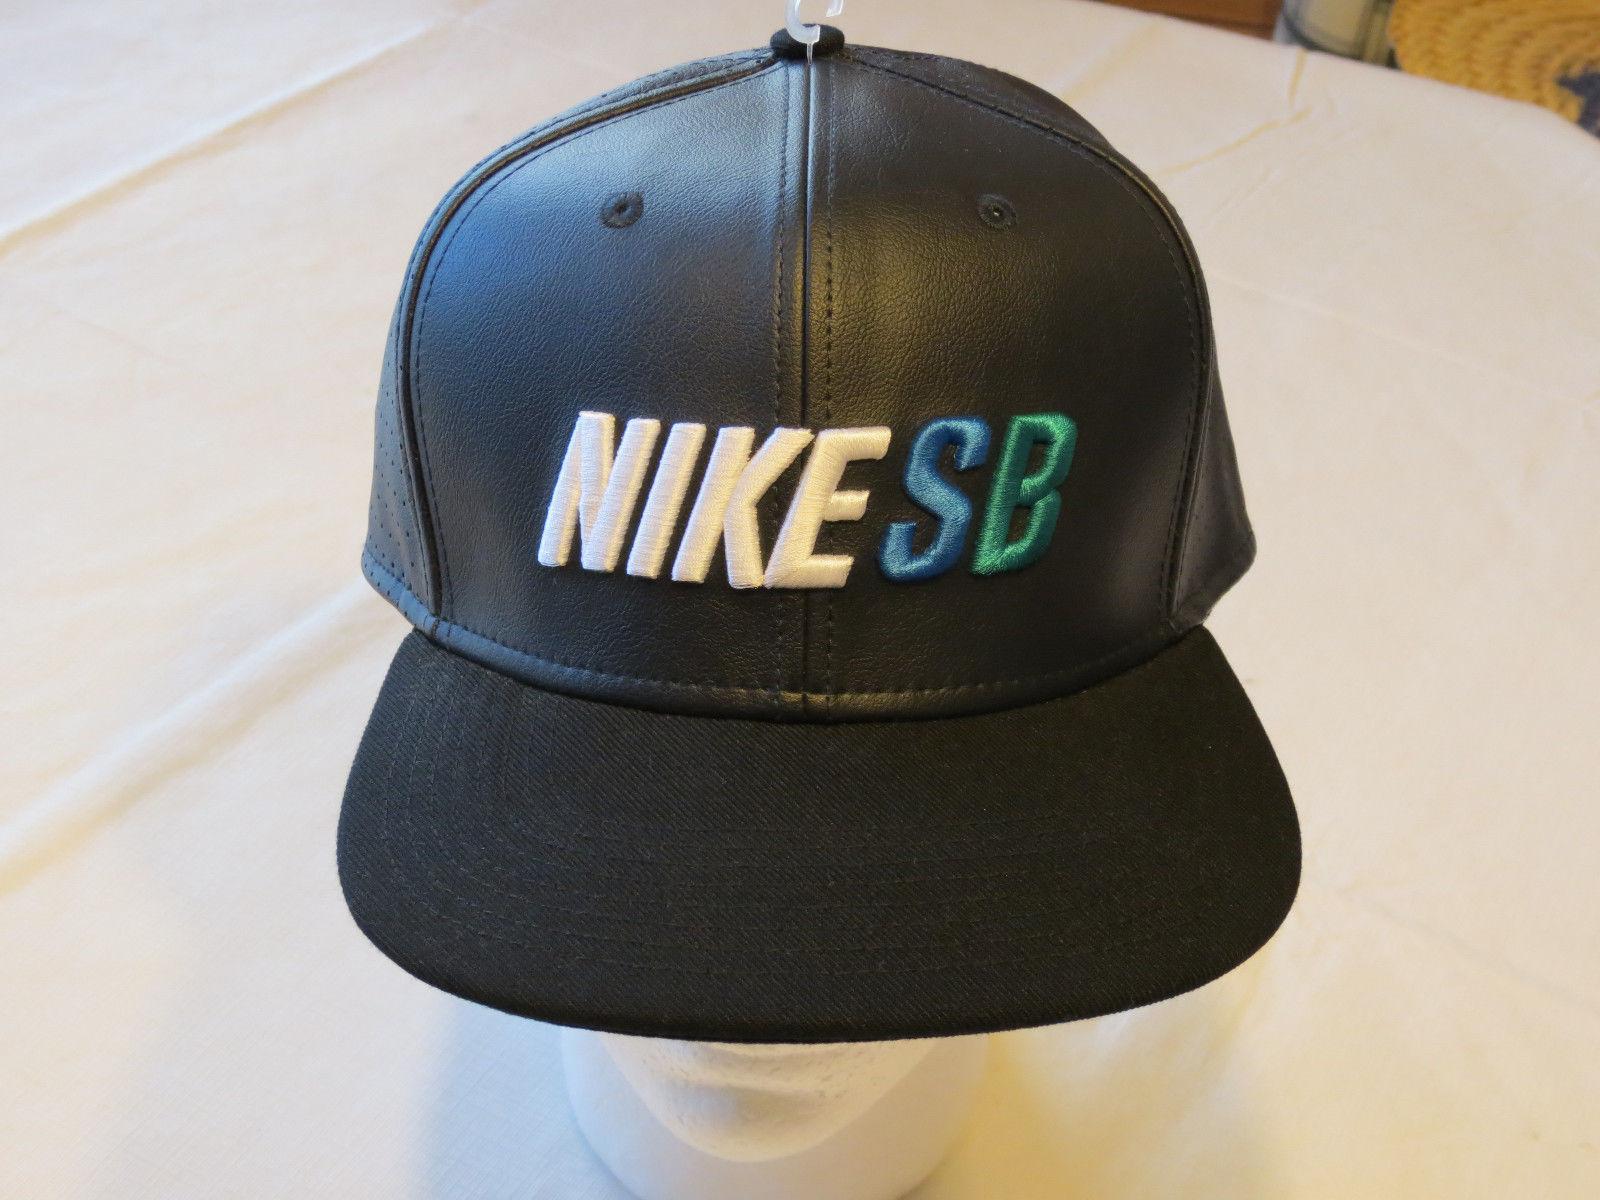 Nike SB hat cap skateboarding Men's Adult unisex snapback 833461 010 black OS